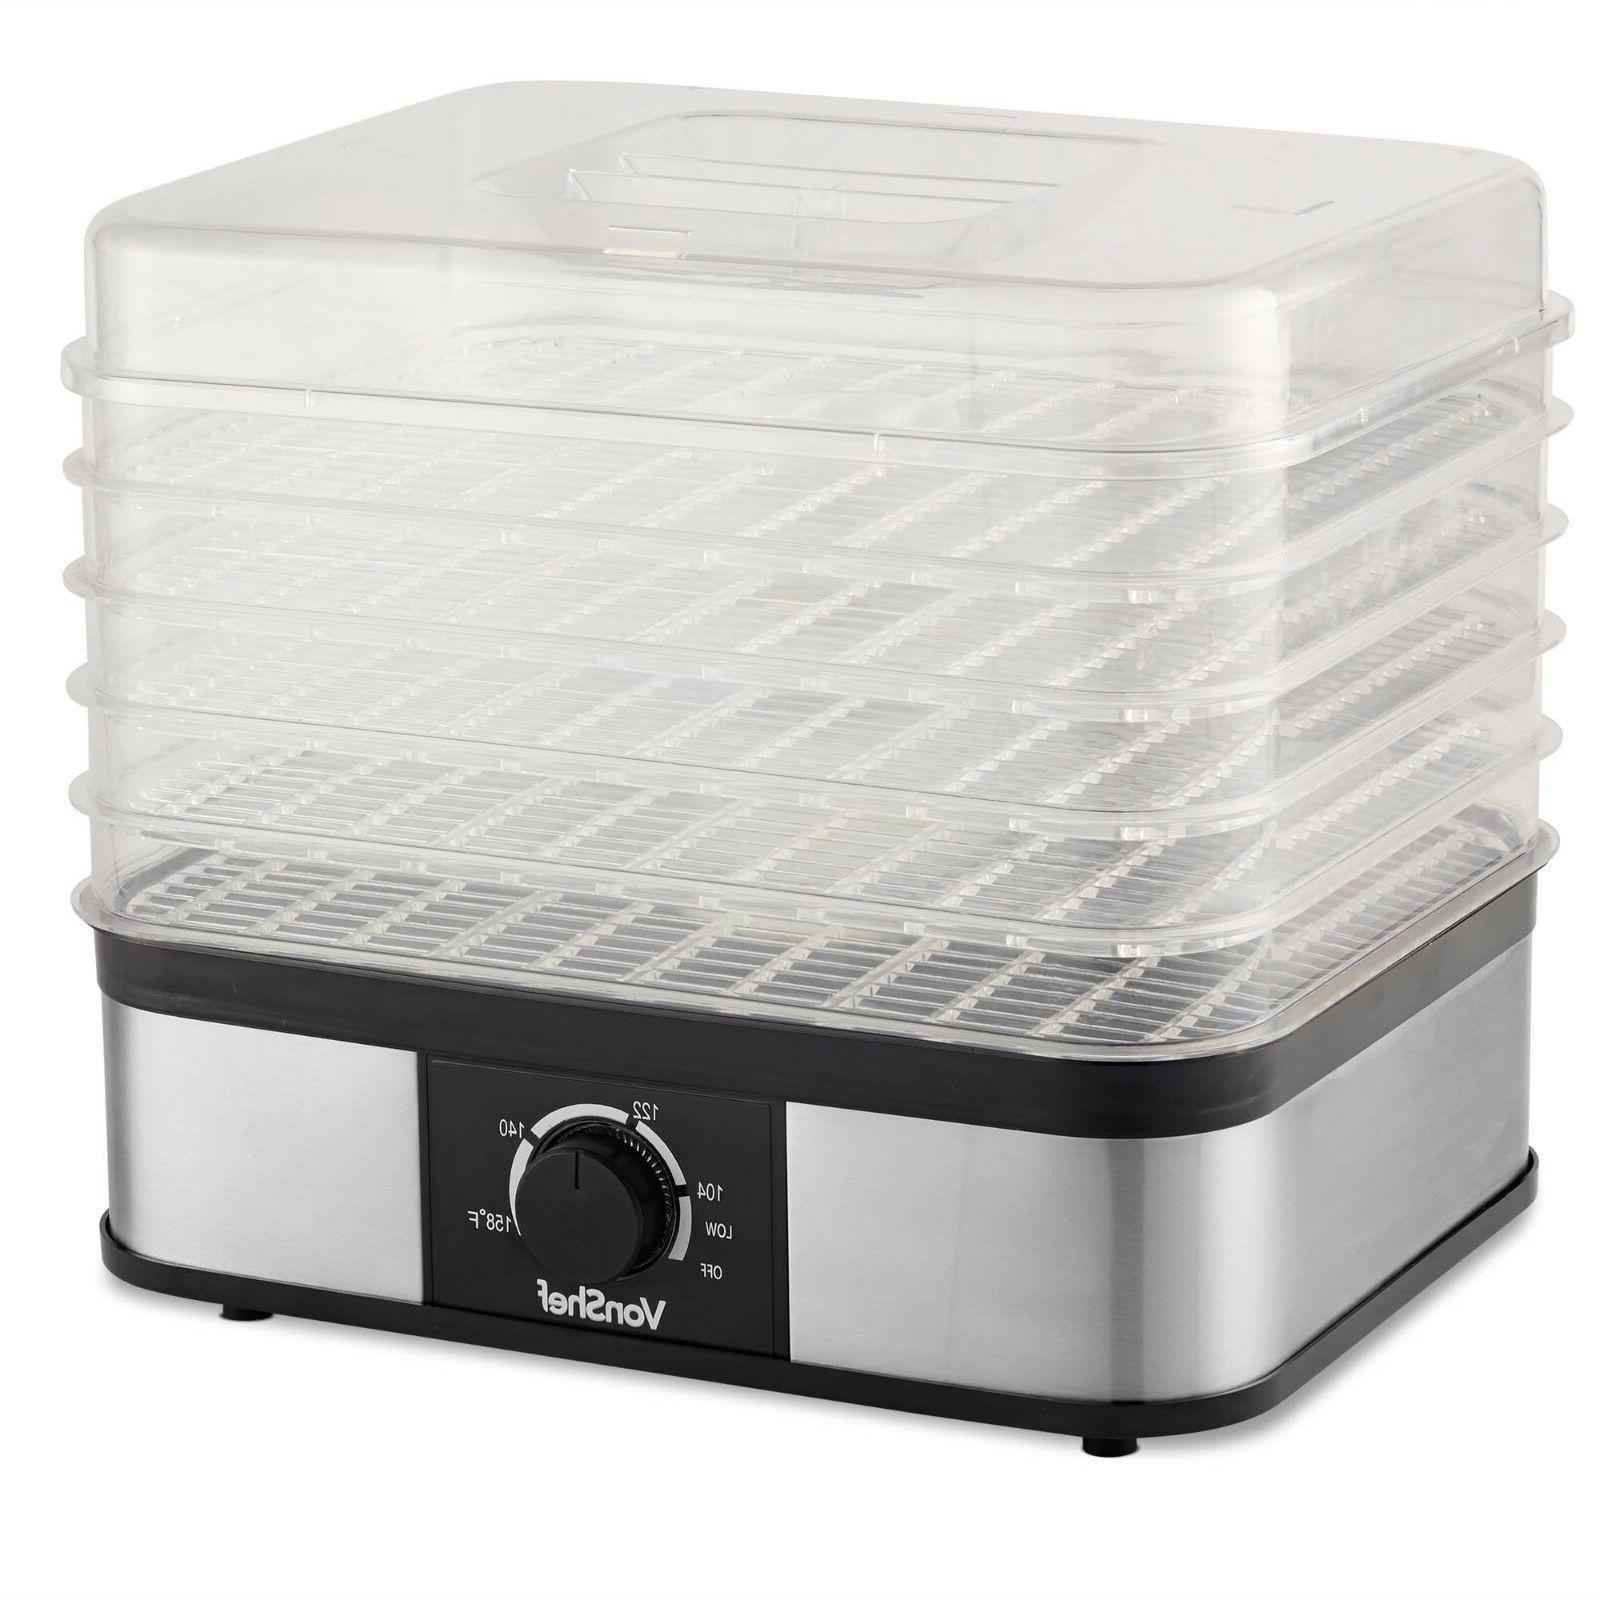 VonShef 5 Tray Food Dehydrator Preserver &